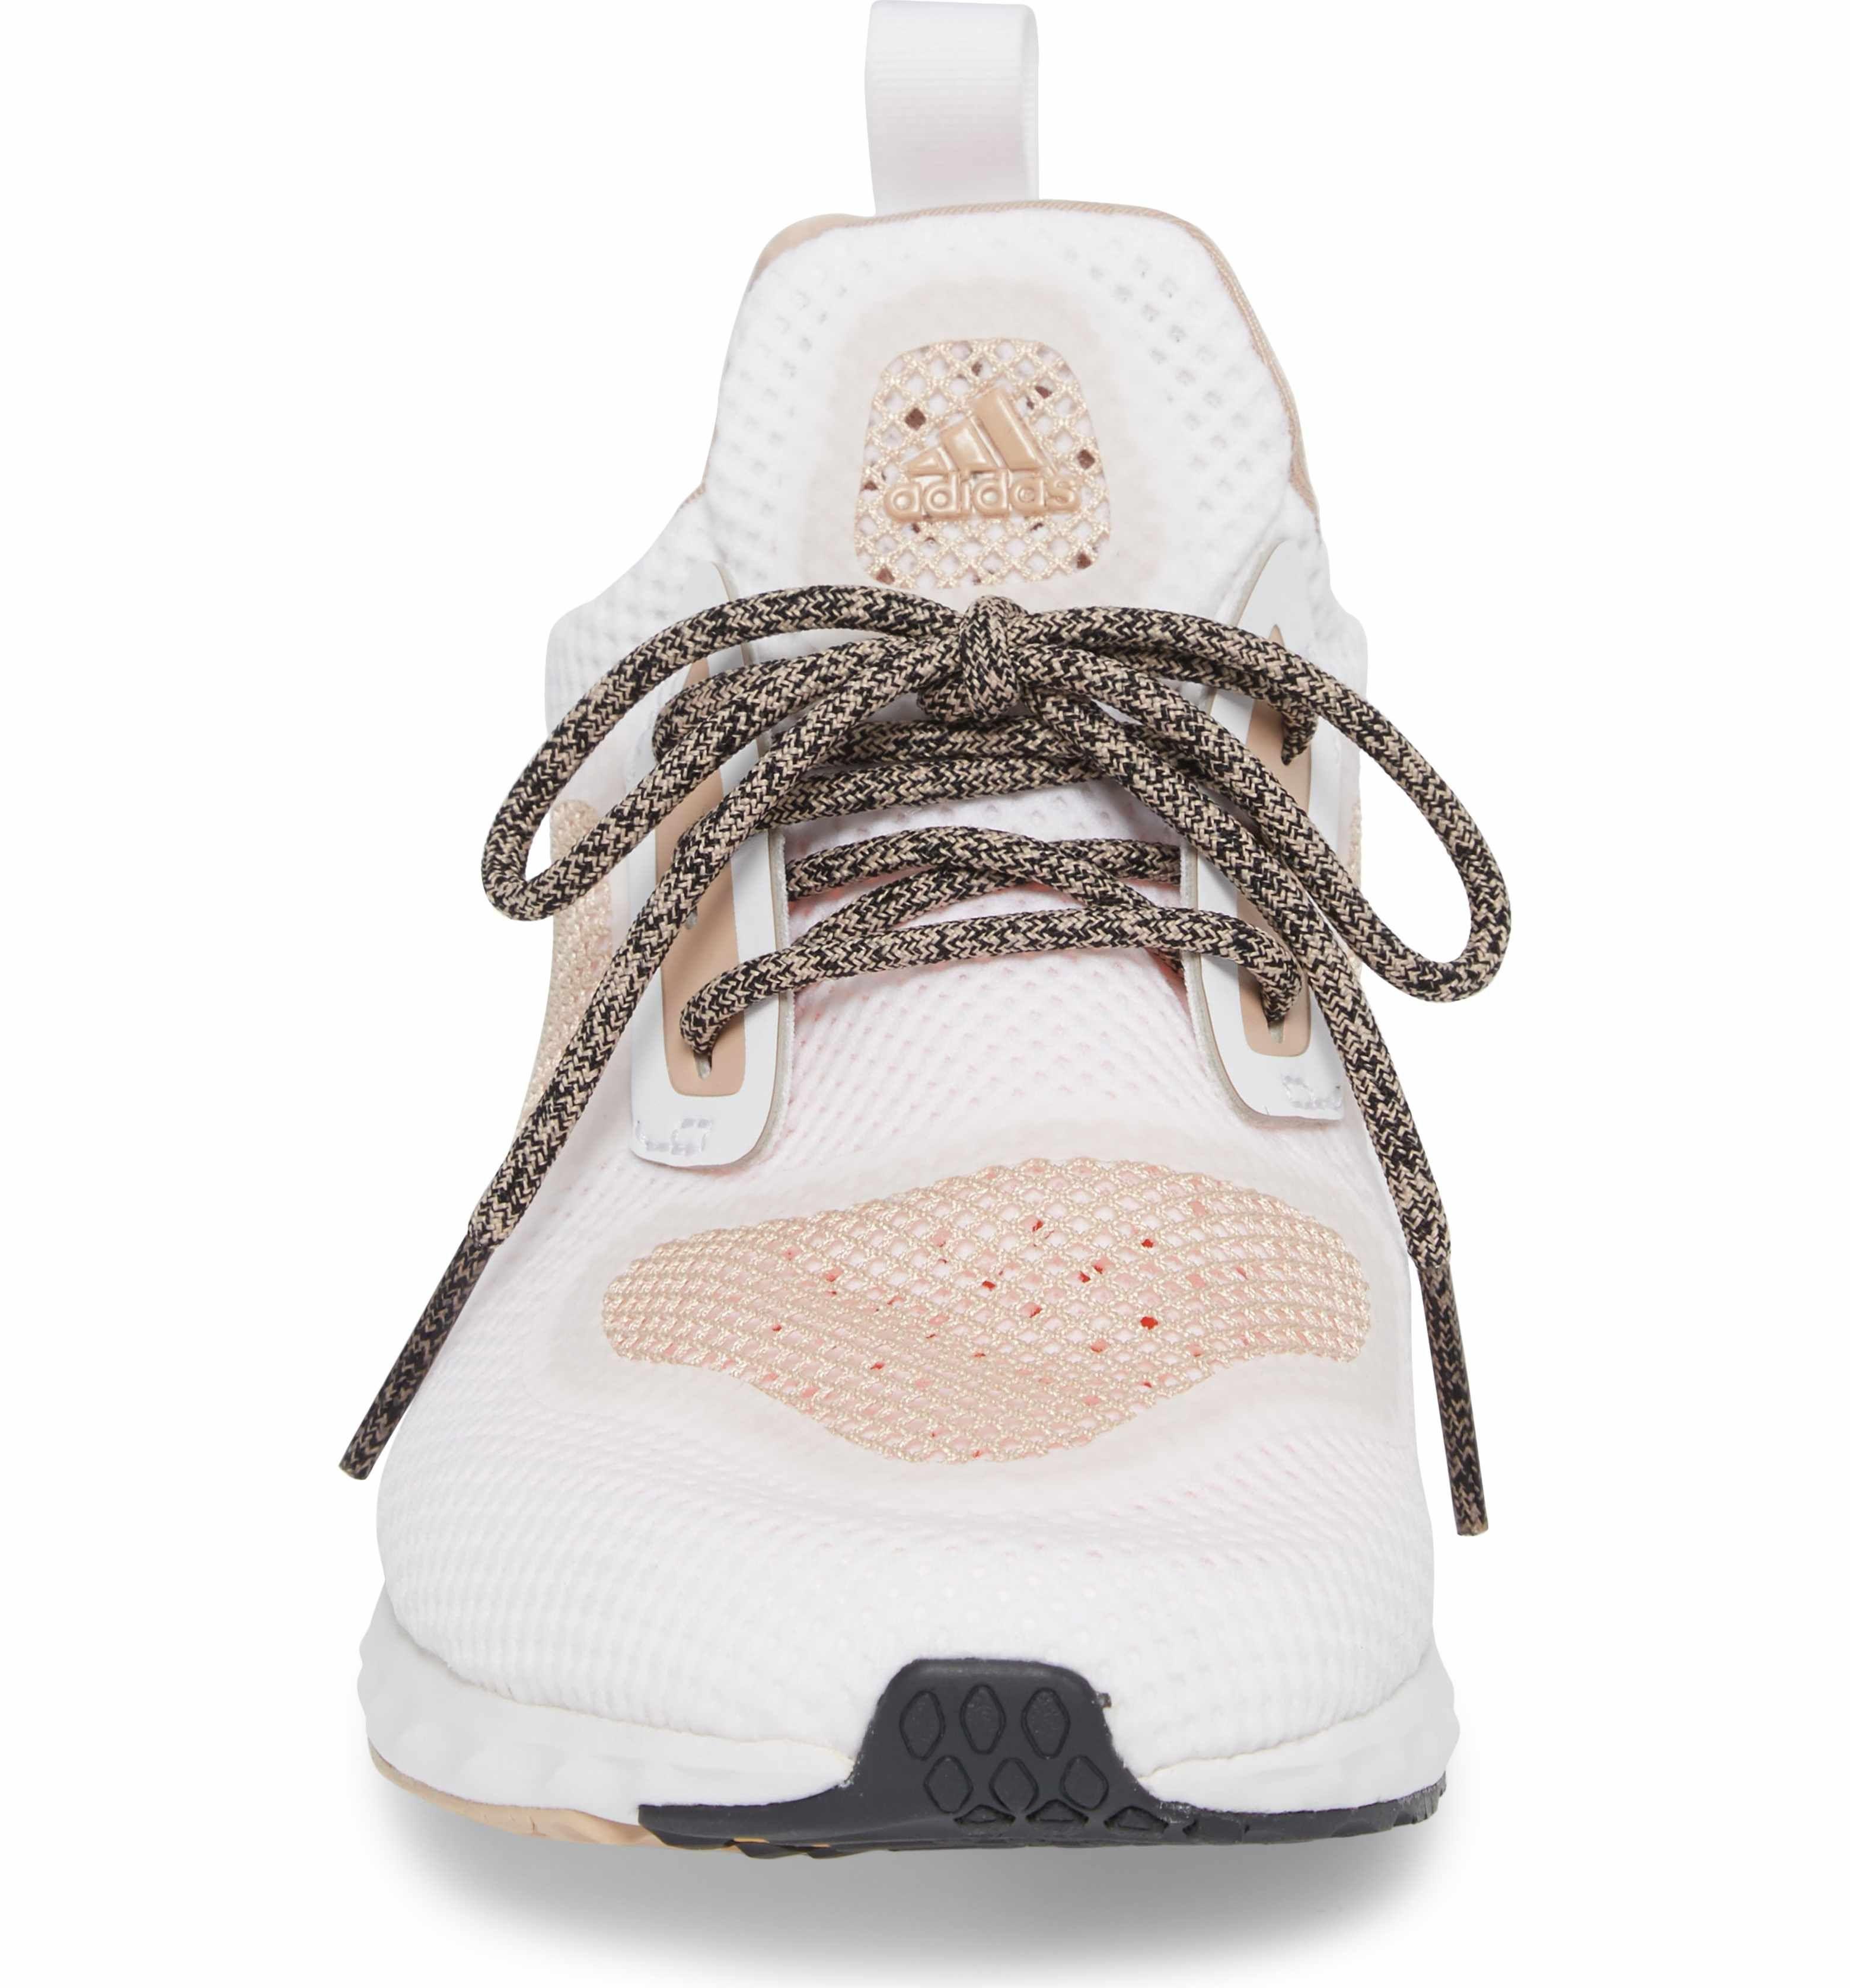 7a7a9ebc274f8b Main Image - adidas Edge Lux Clima Running Shoe (Women)